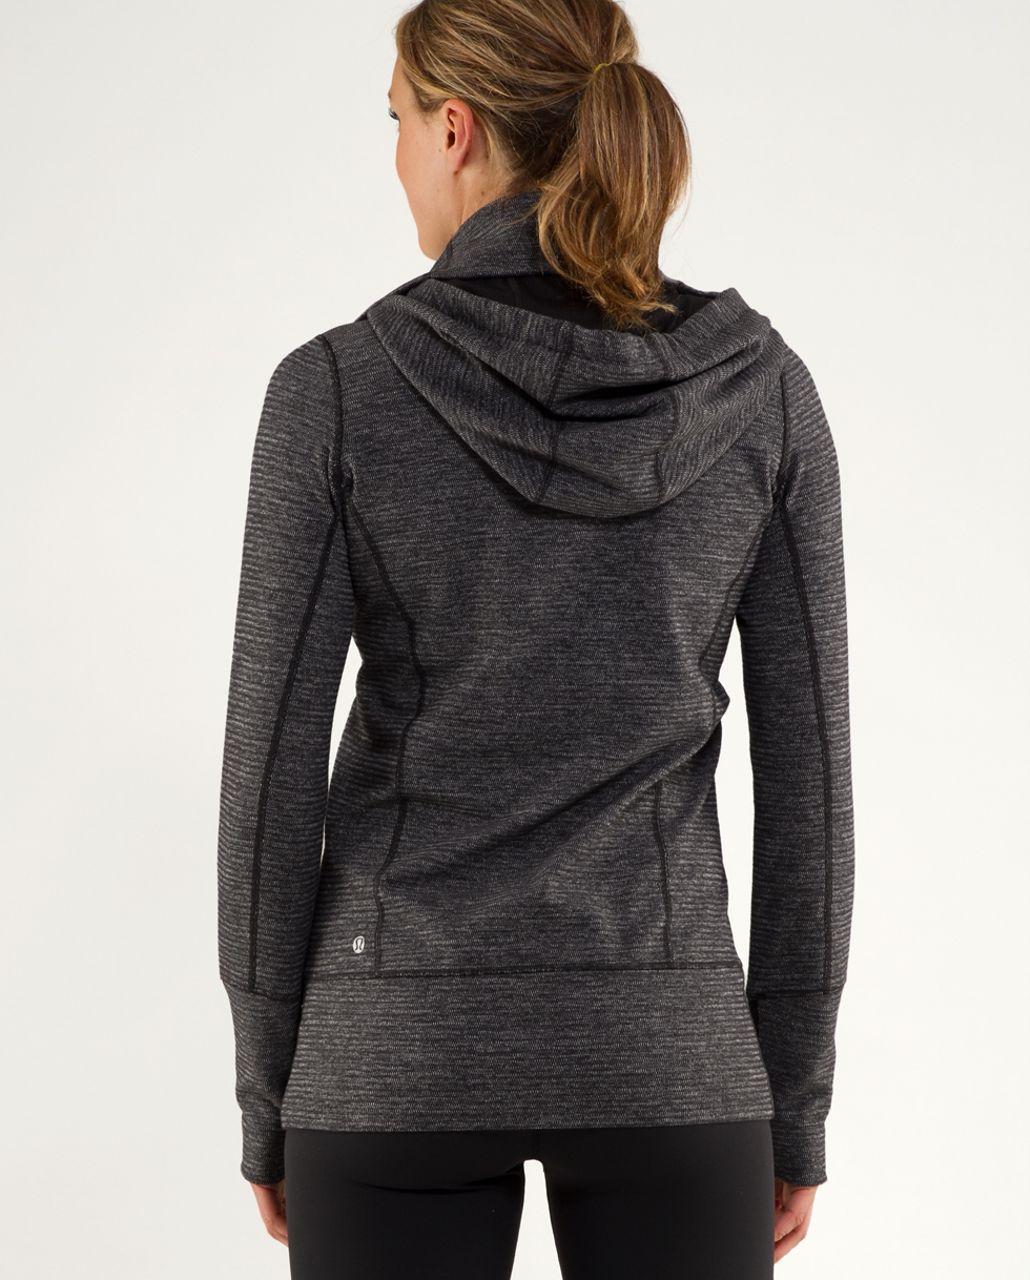 Lululemon Stride Jacket *Soft Mini Check - Black Heathered Coal Mini Check /  Black